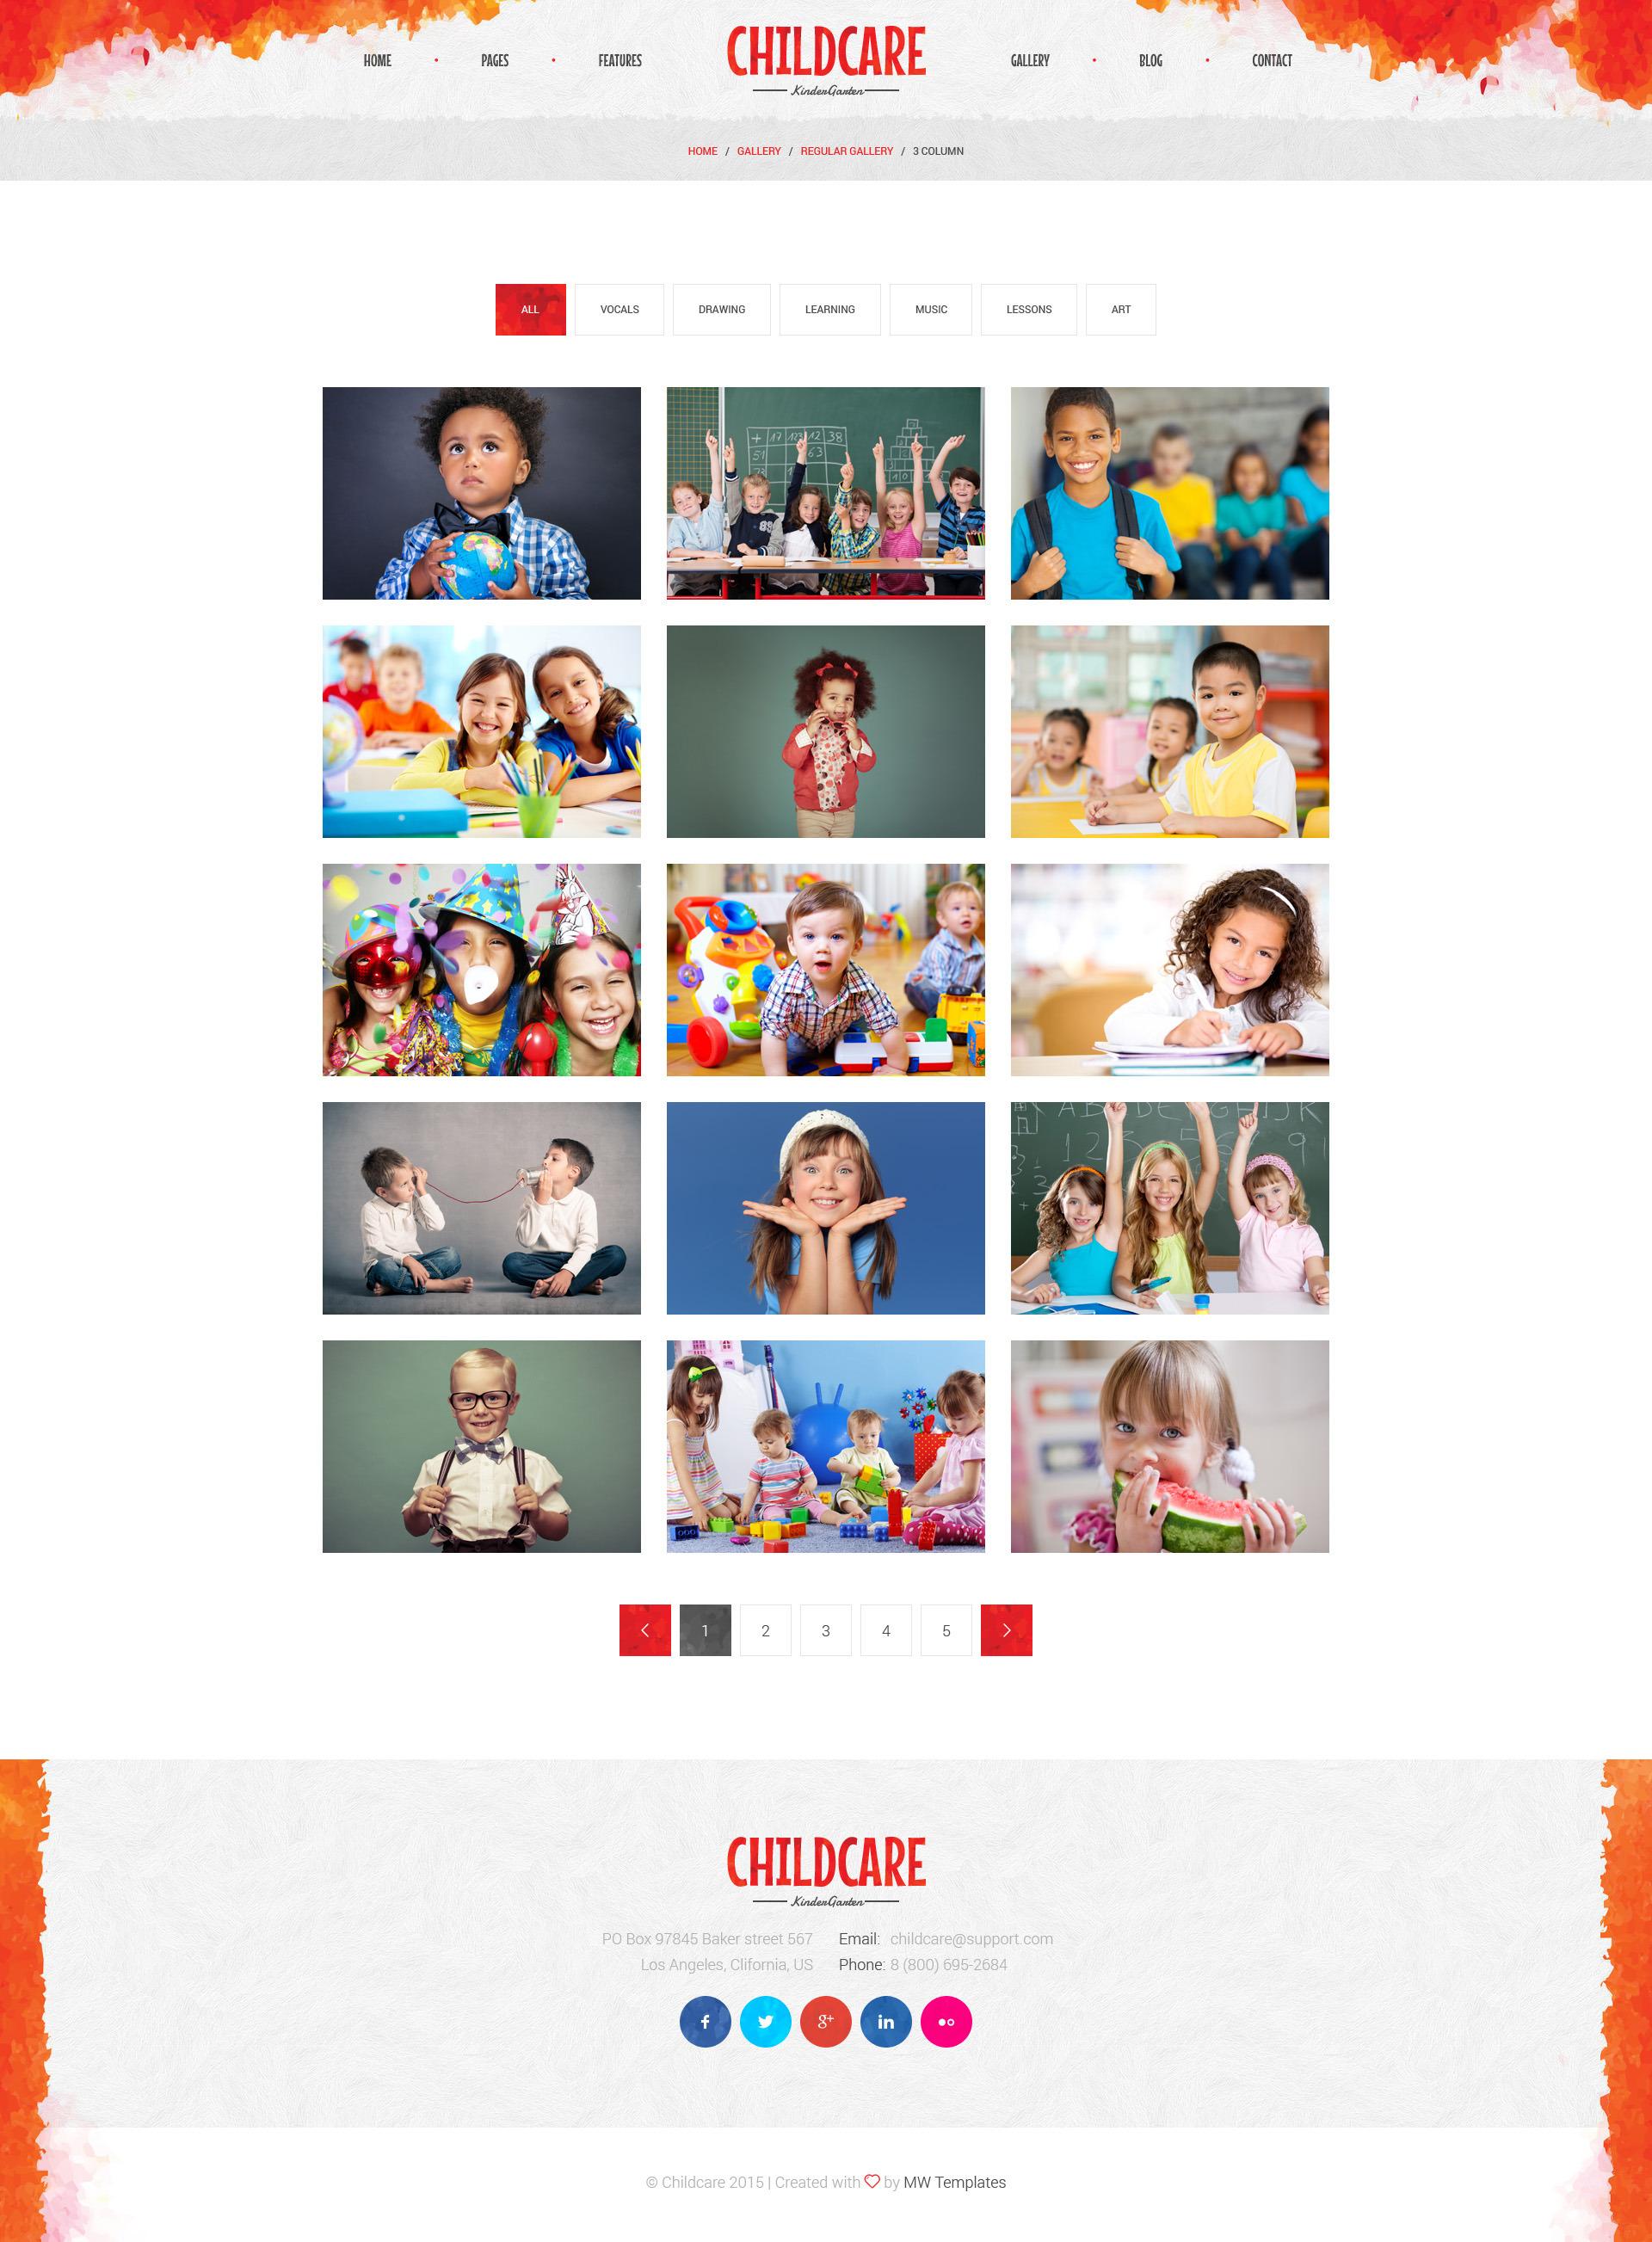 child care children kindergarten psd template by mwtemplates child care children kindergarten psd template